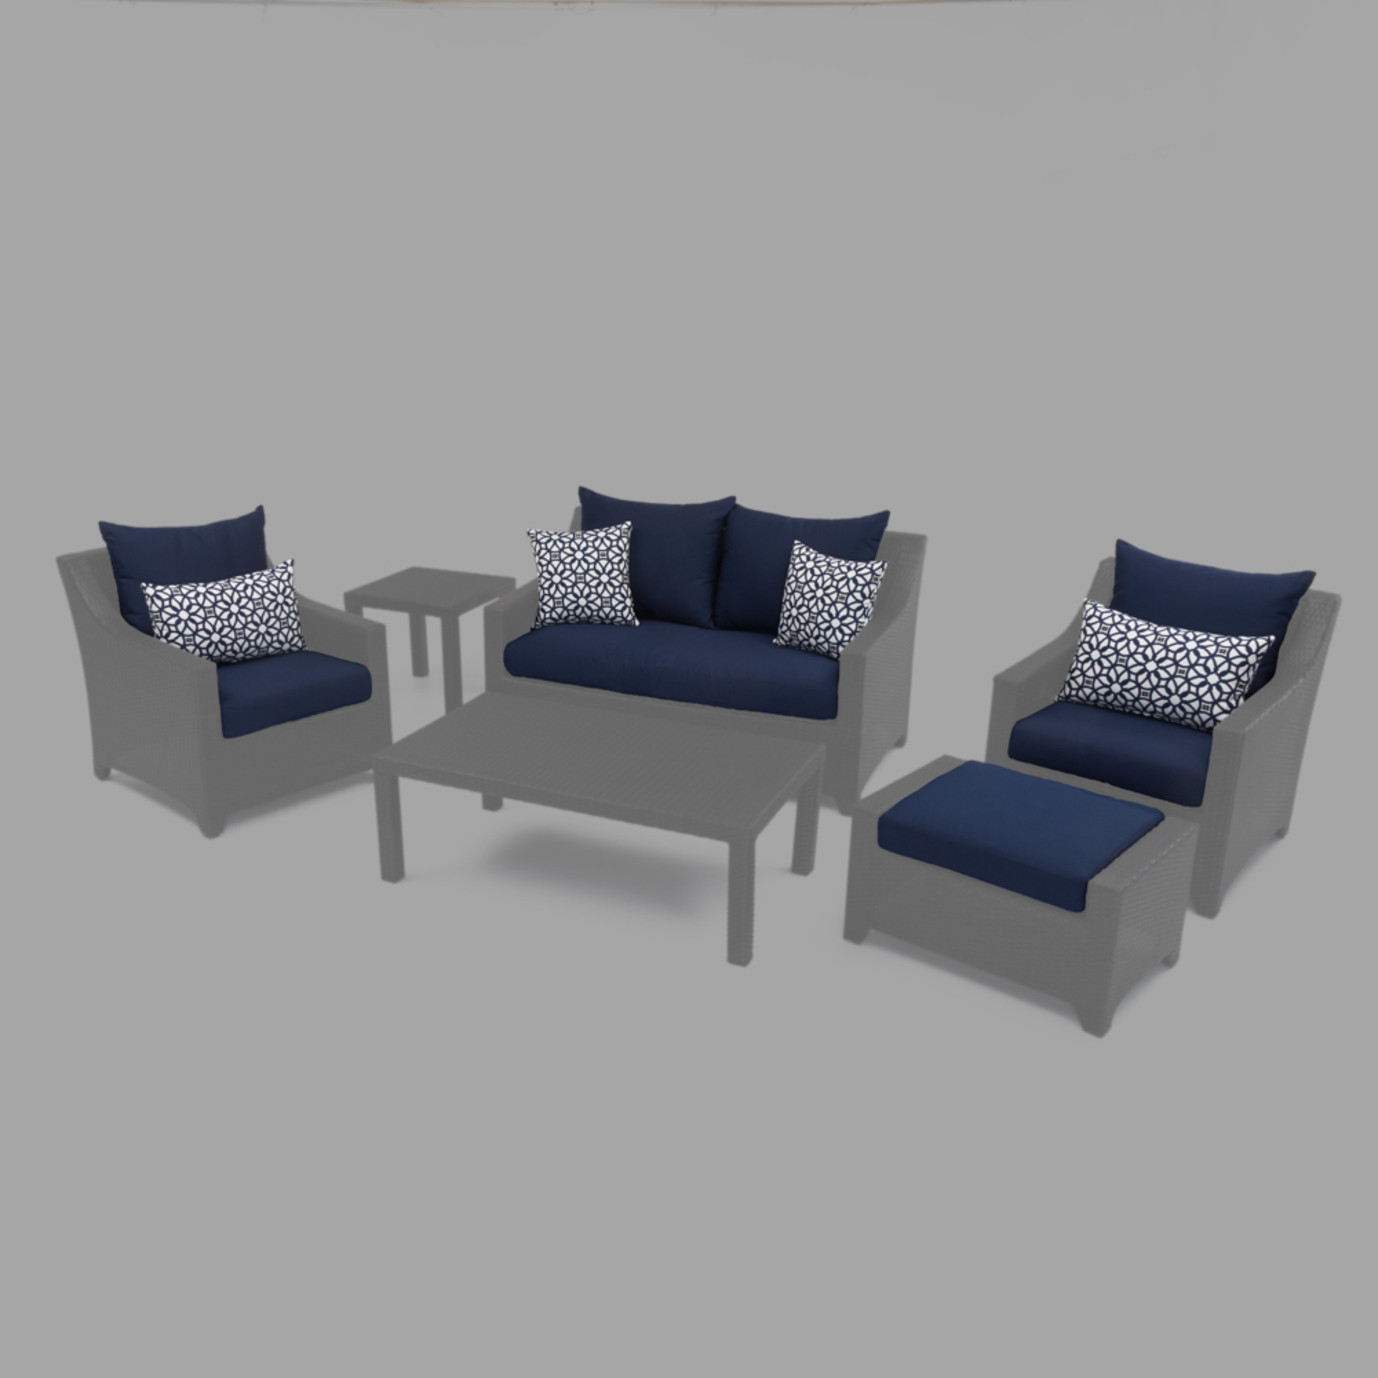 Modular Outdoor 6 Piece Love Cushion Cover Set - Navy Blue